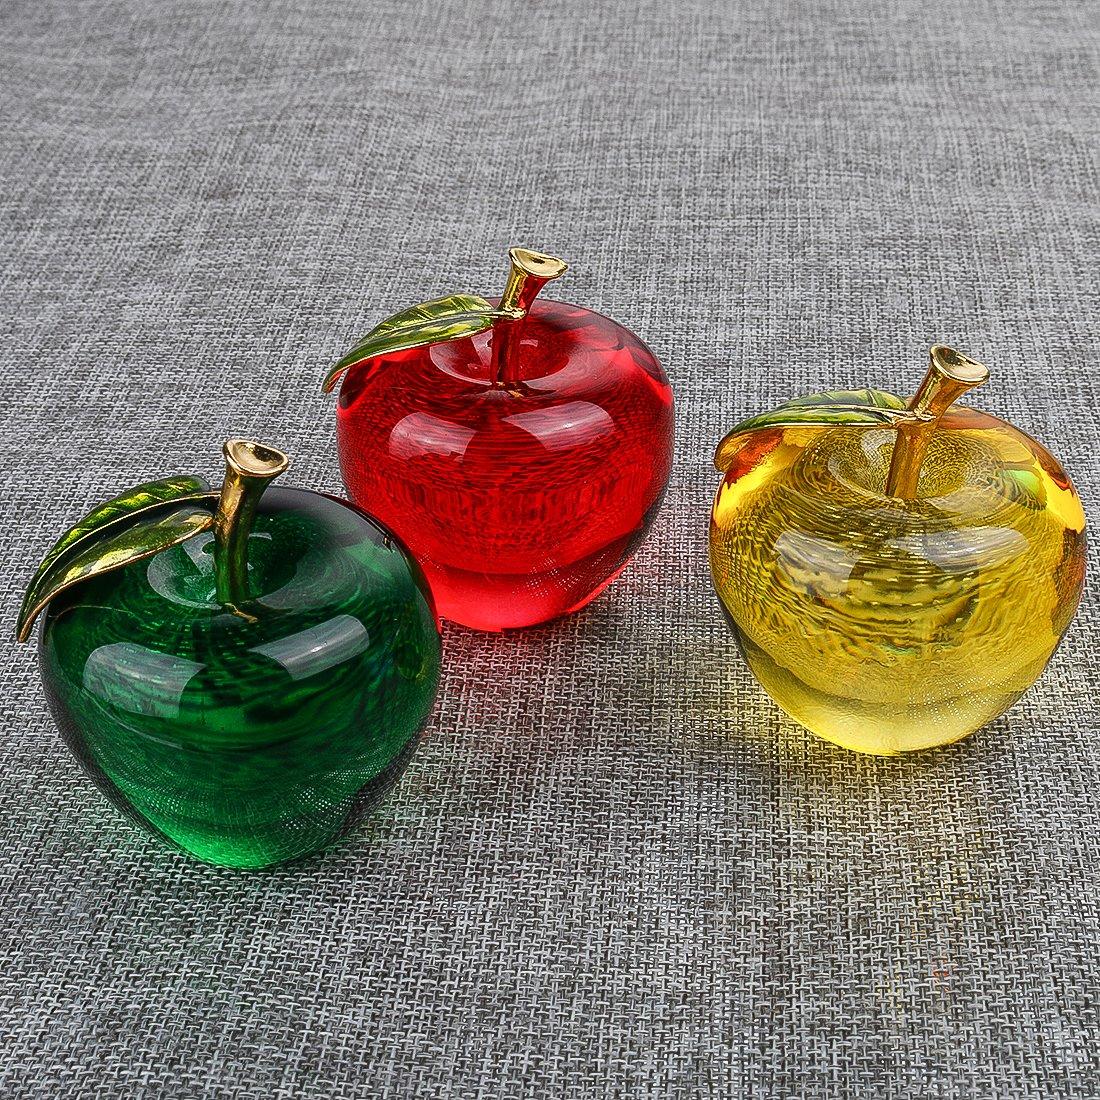 H&D Glasur Crystal Apple Briefbeschwerer Craft Dekoration, Dekoration, Dekoration, 3 Stück. B07D4D4N6M | Moderate Kosten  a8128f